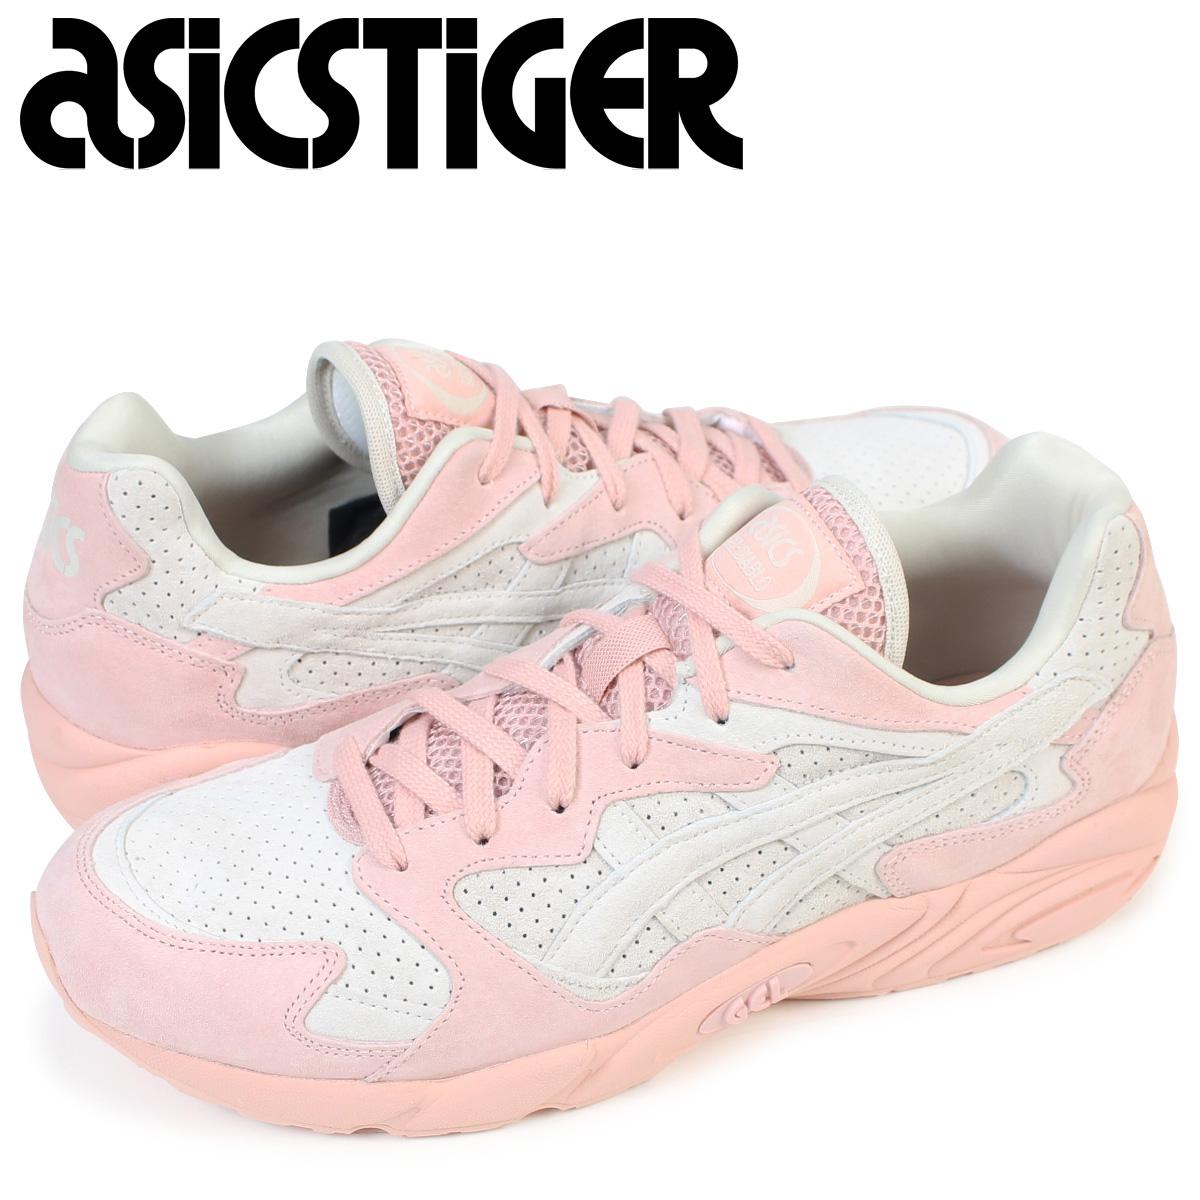 asics Tiger アシックスタイガー スニーカー GEL-DIABLO HL7U0-0202 メンズ 靴 ホワイト 【決算セール 返品不可】